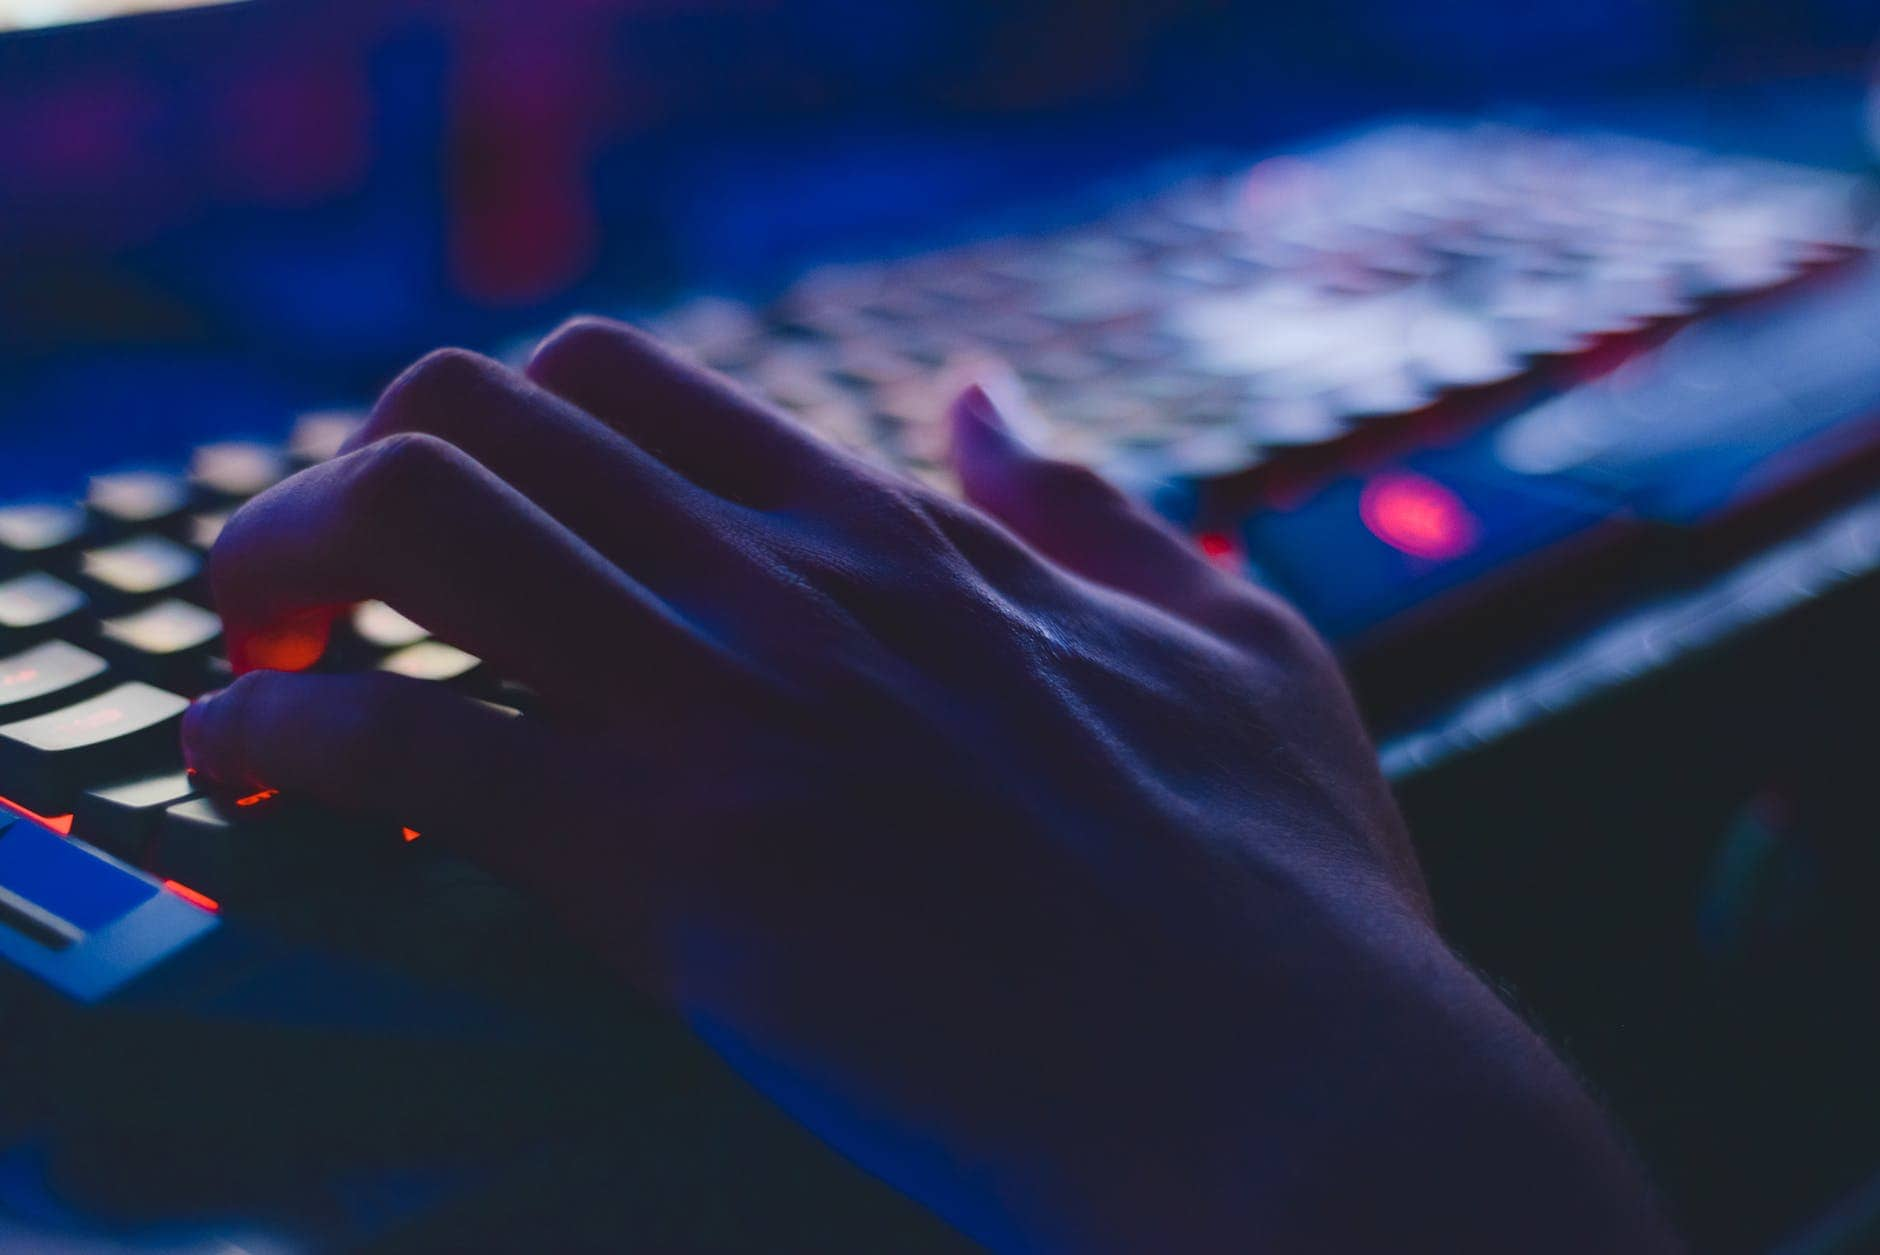 mejores-teclados-mecanicos-2019